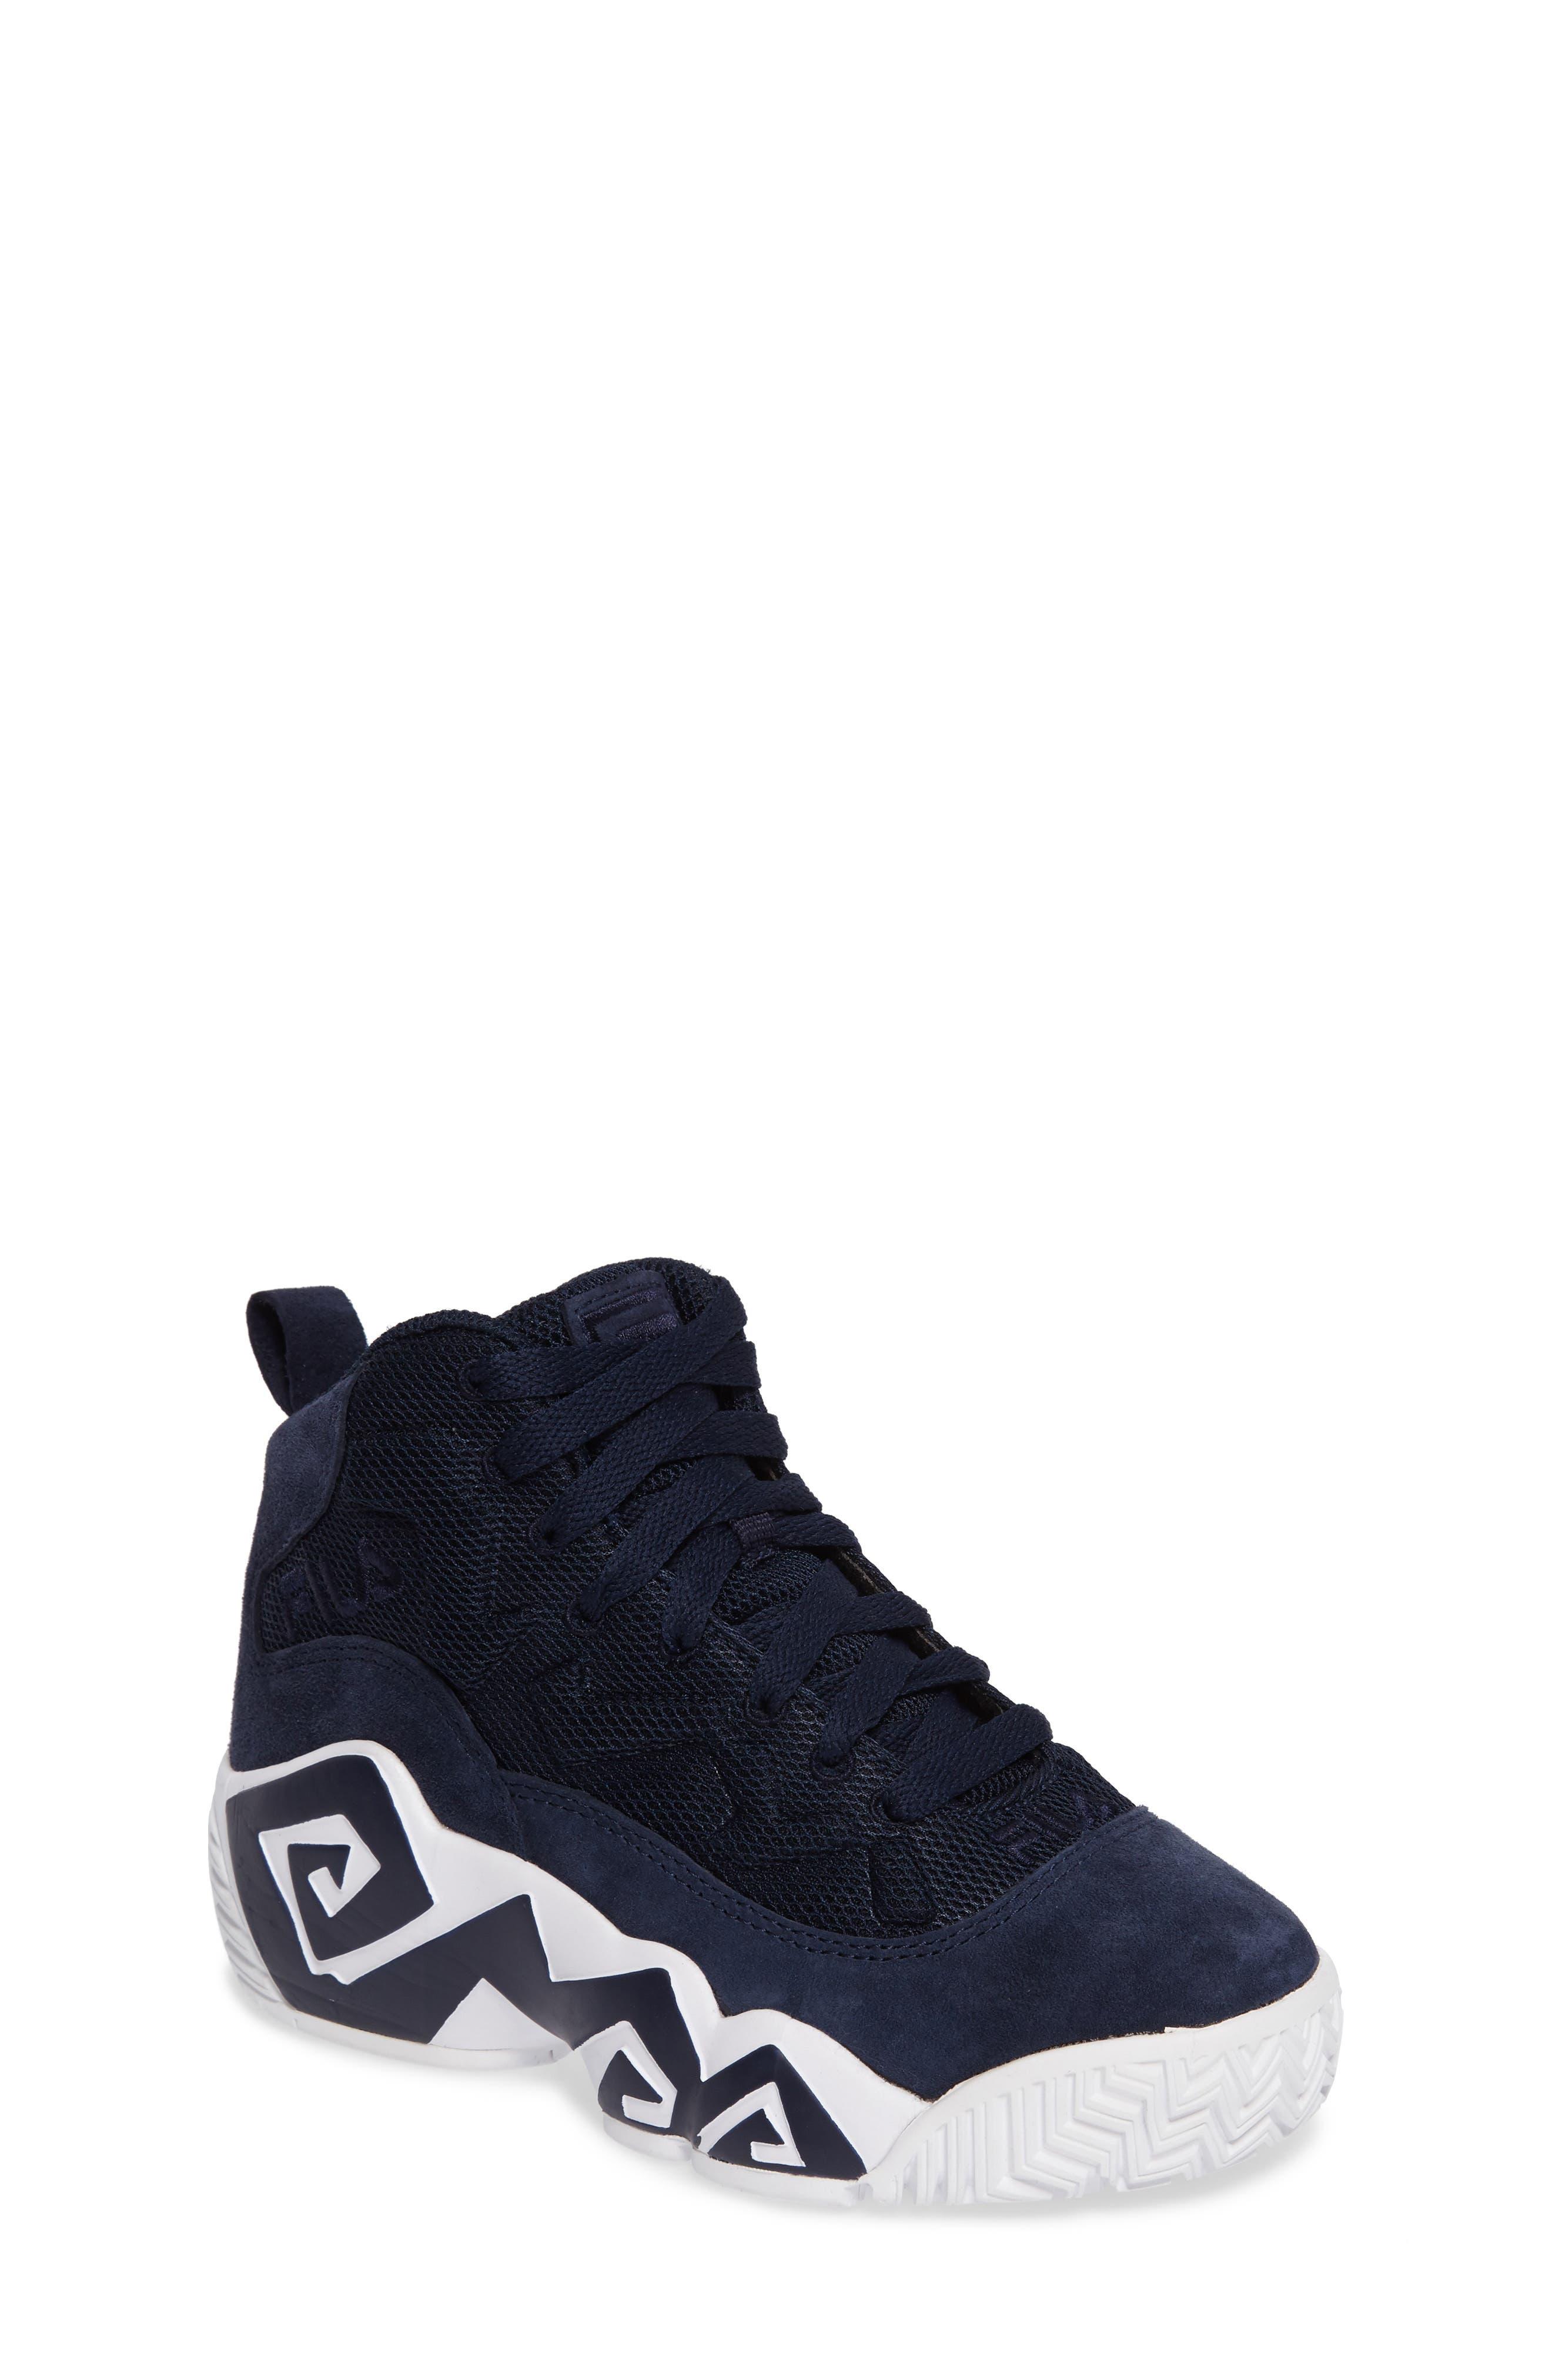 MB Mesh Sneaker,                         Main,                         color, Navy/ White